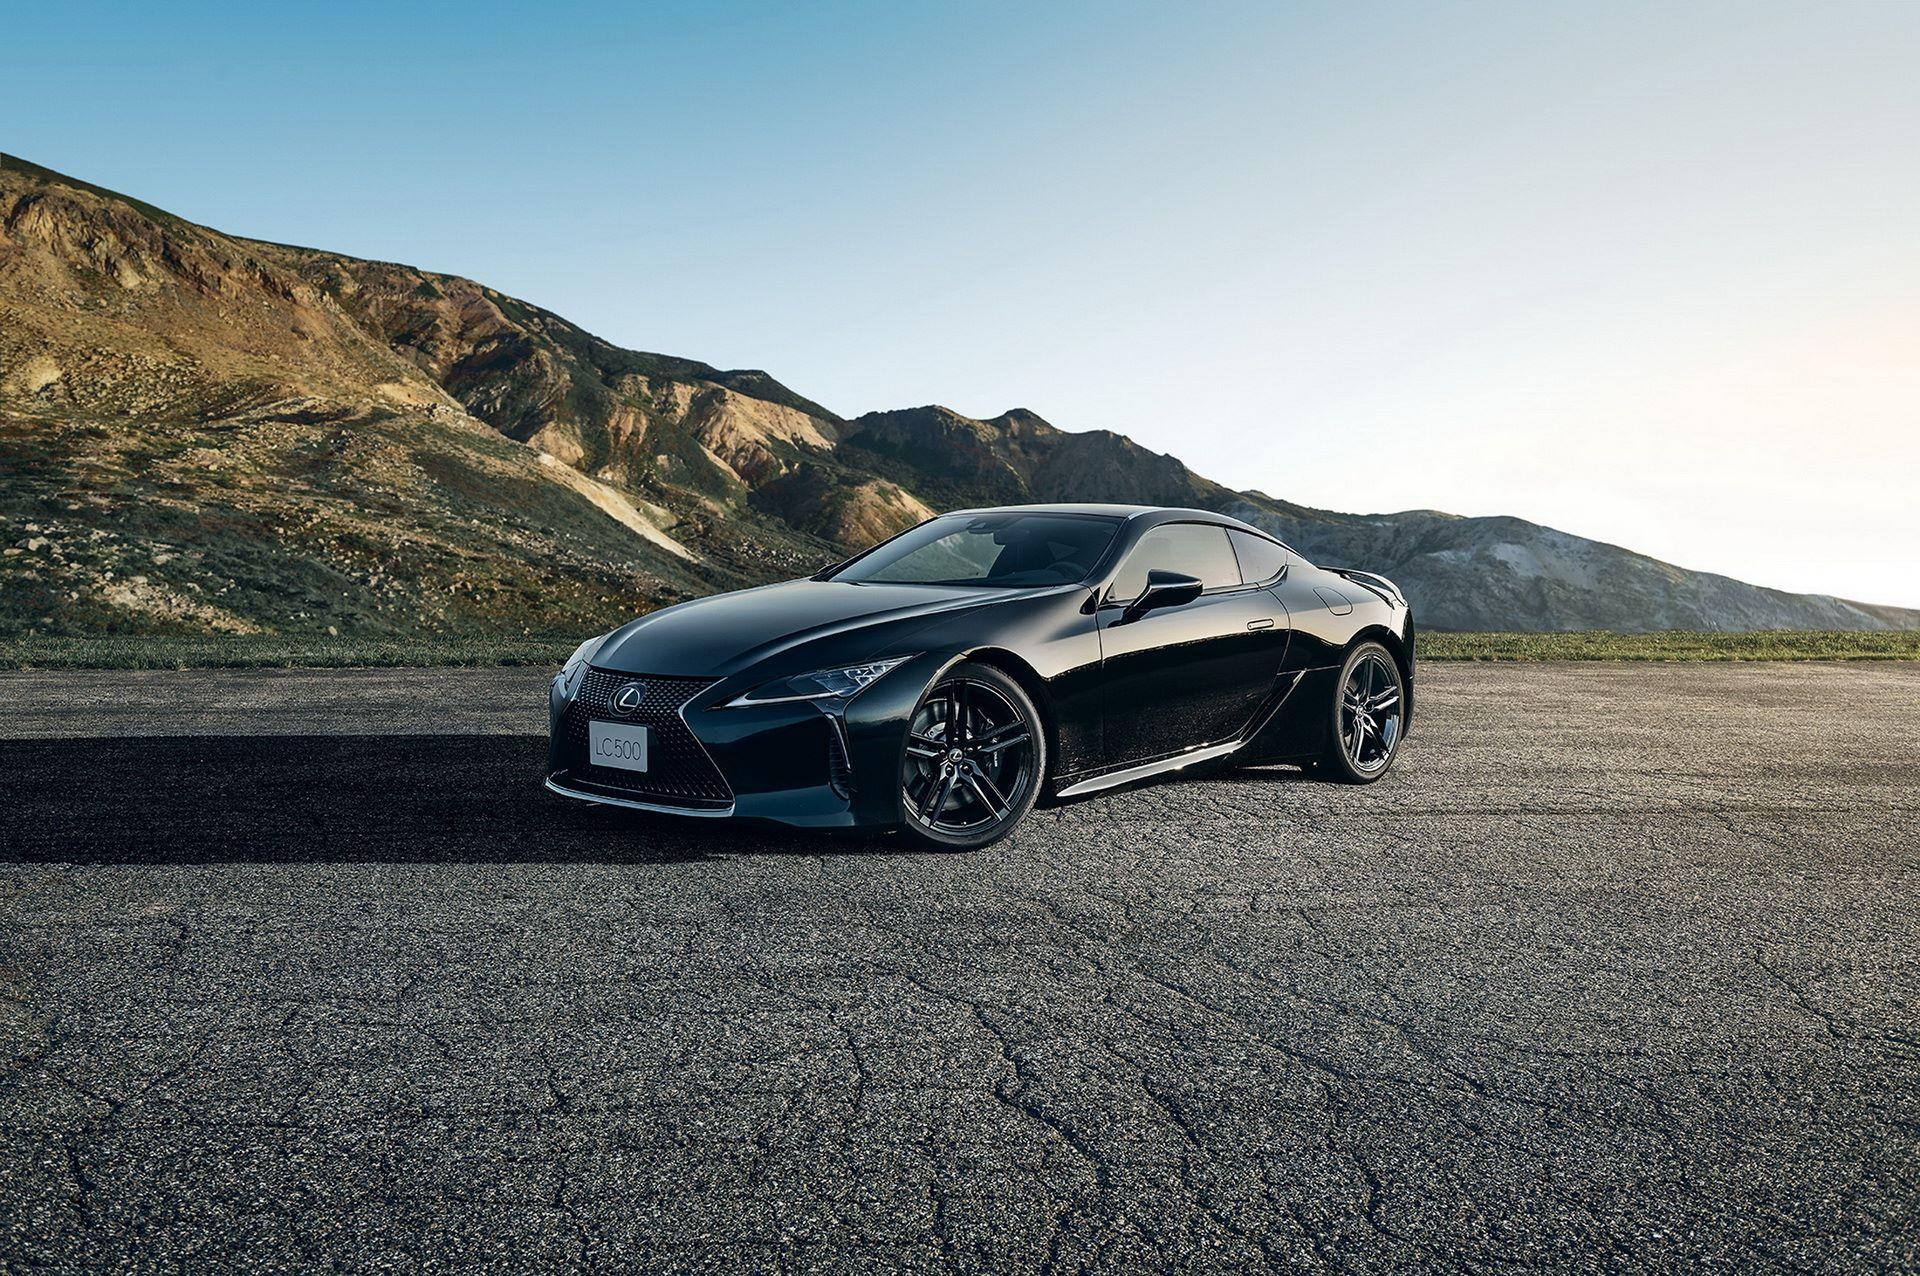 Lexus-LC-500-Inspiration-Series-2021-17